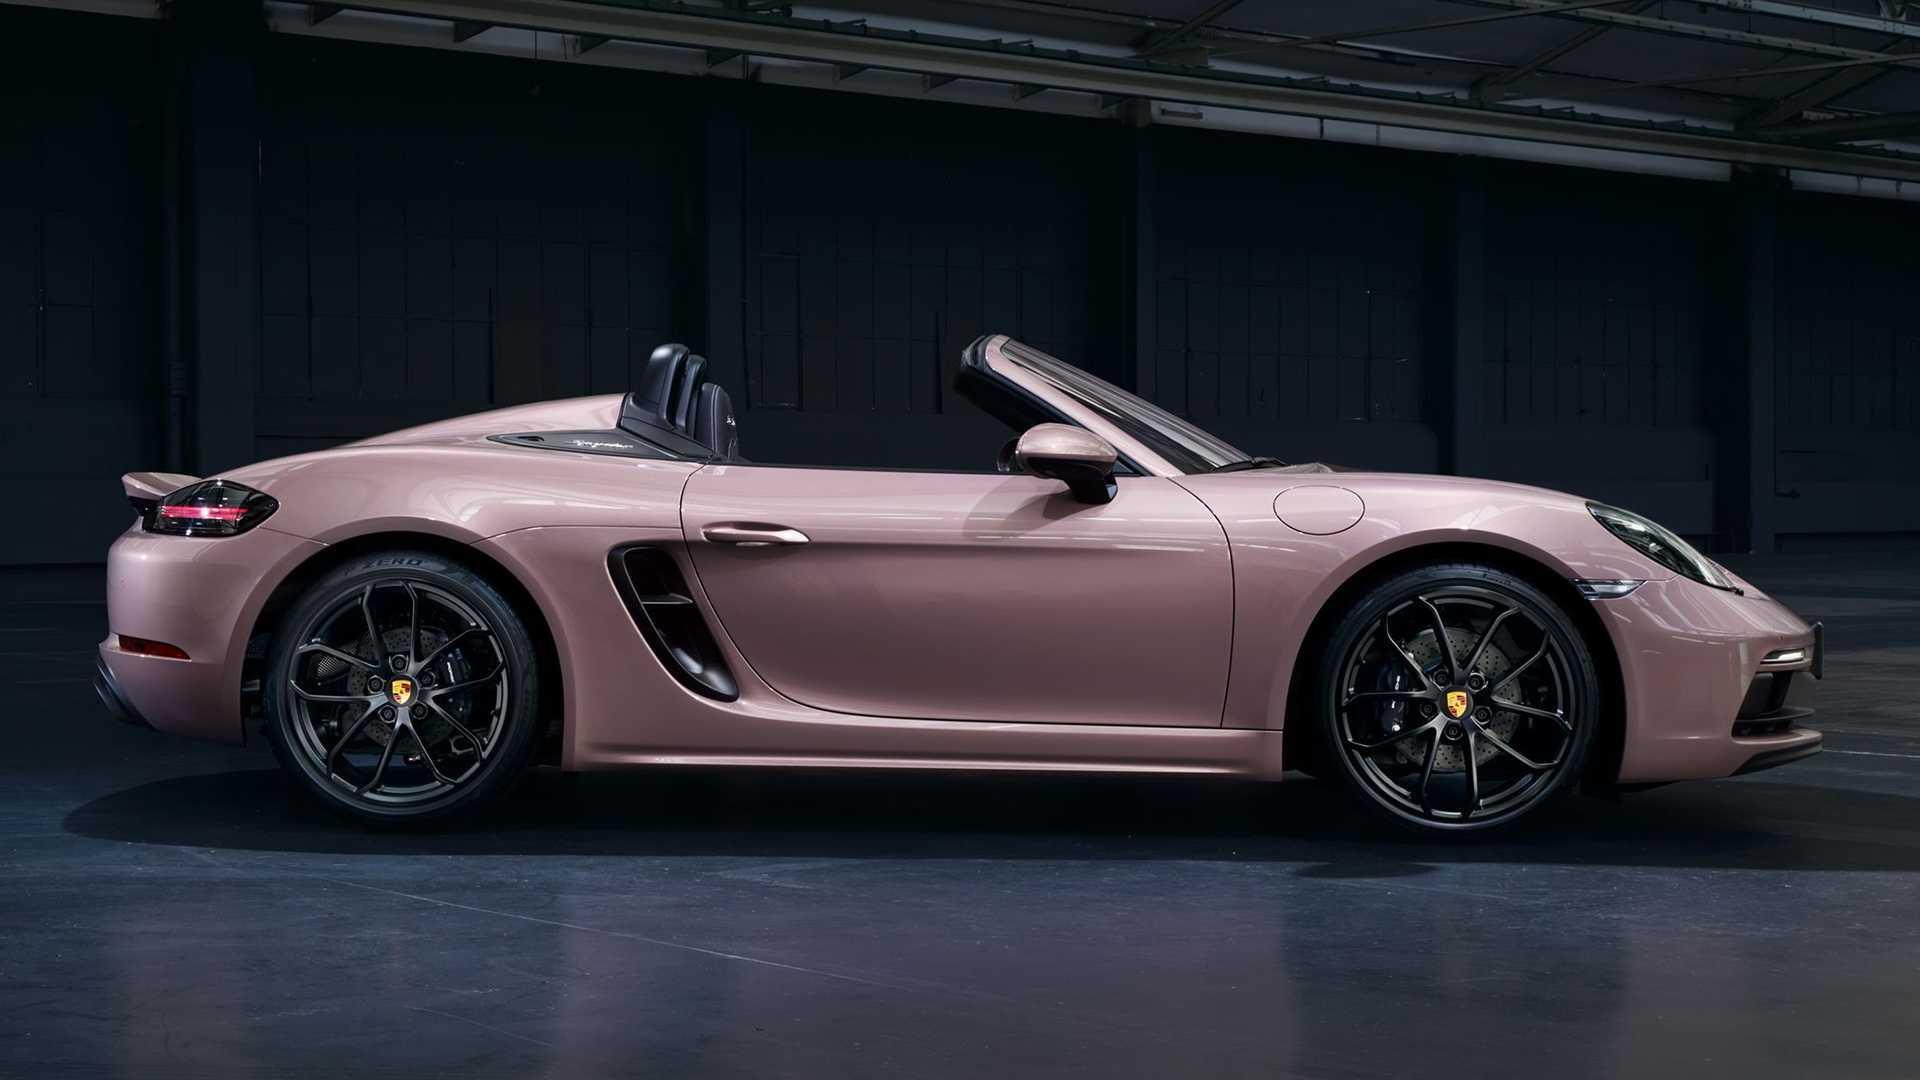 Porsche 718 spyder 2021 4 cylindres 4